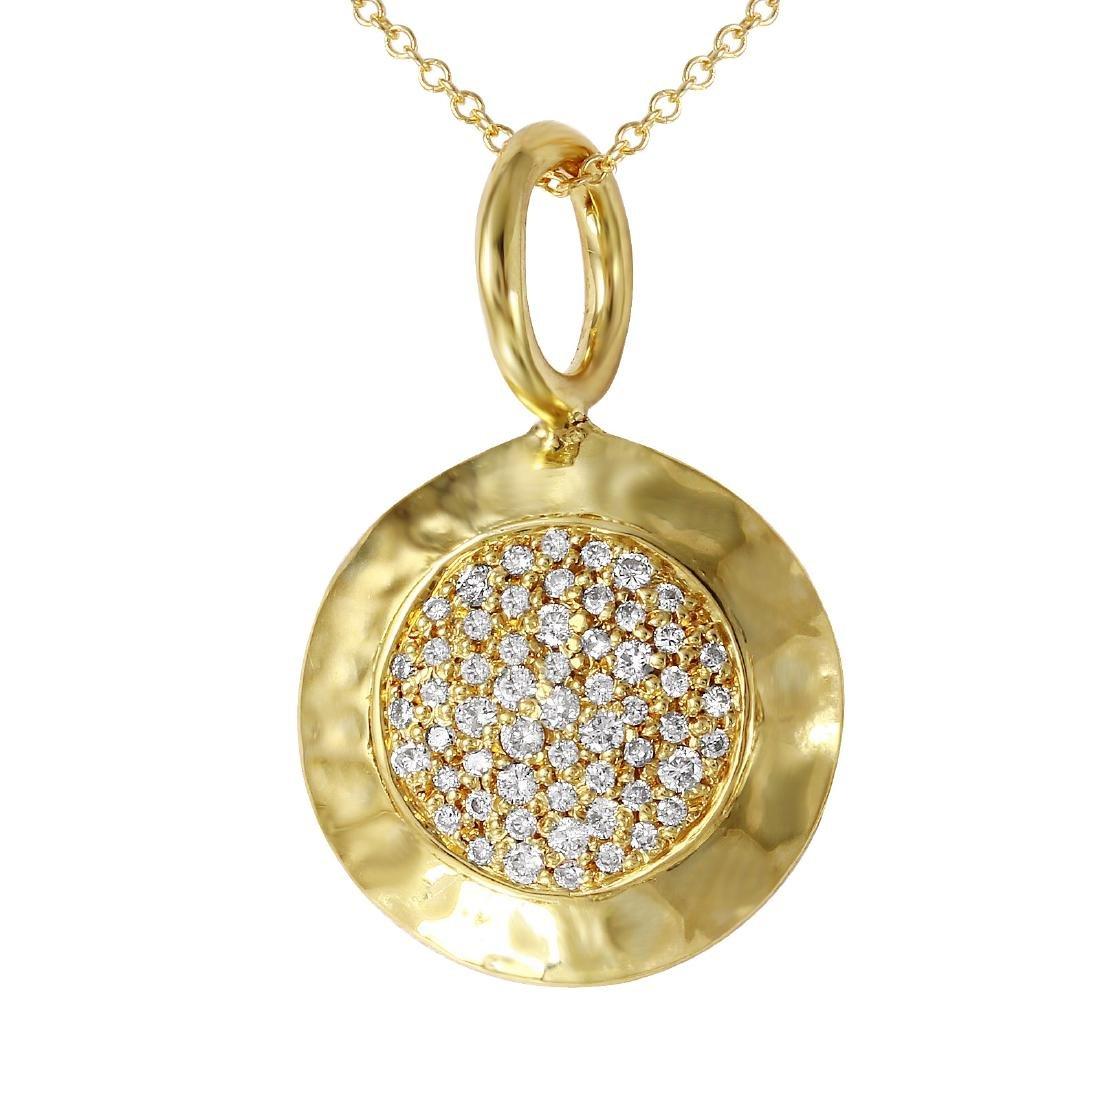 Ippolita 18KT Yellow Gold Diamond Necklace